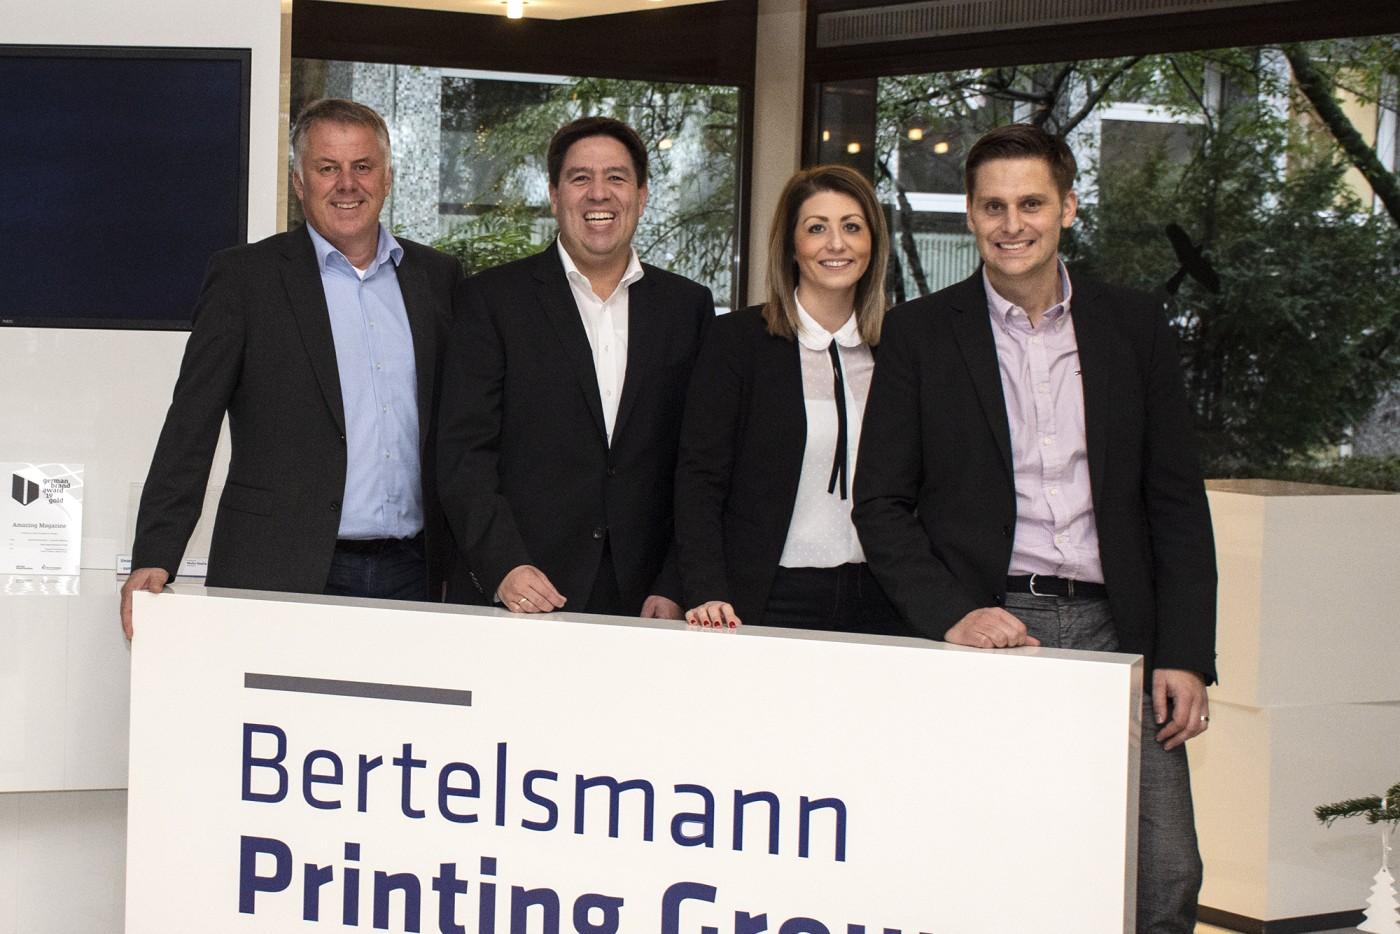 20191203_team_bertelsmann_printing_group